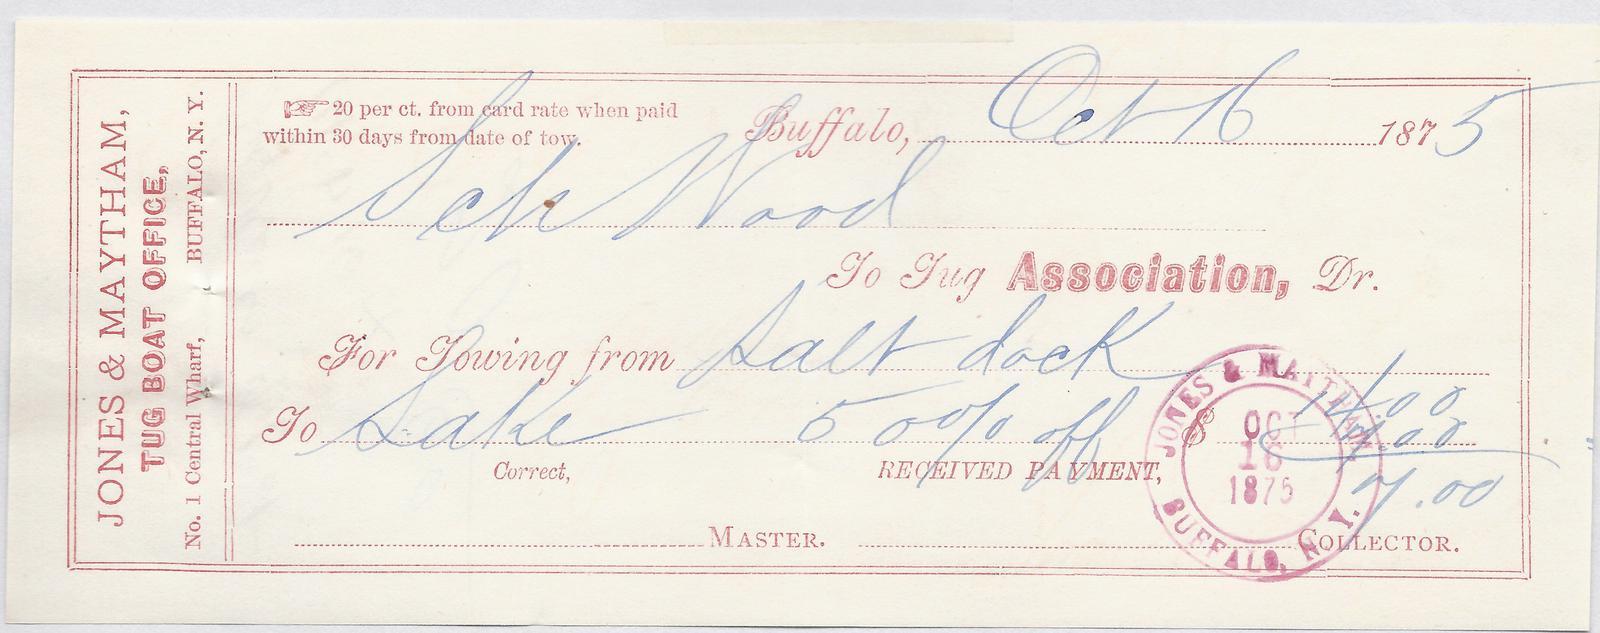 Tug Association to S. A. Wood, Receipt